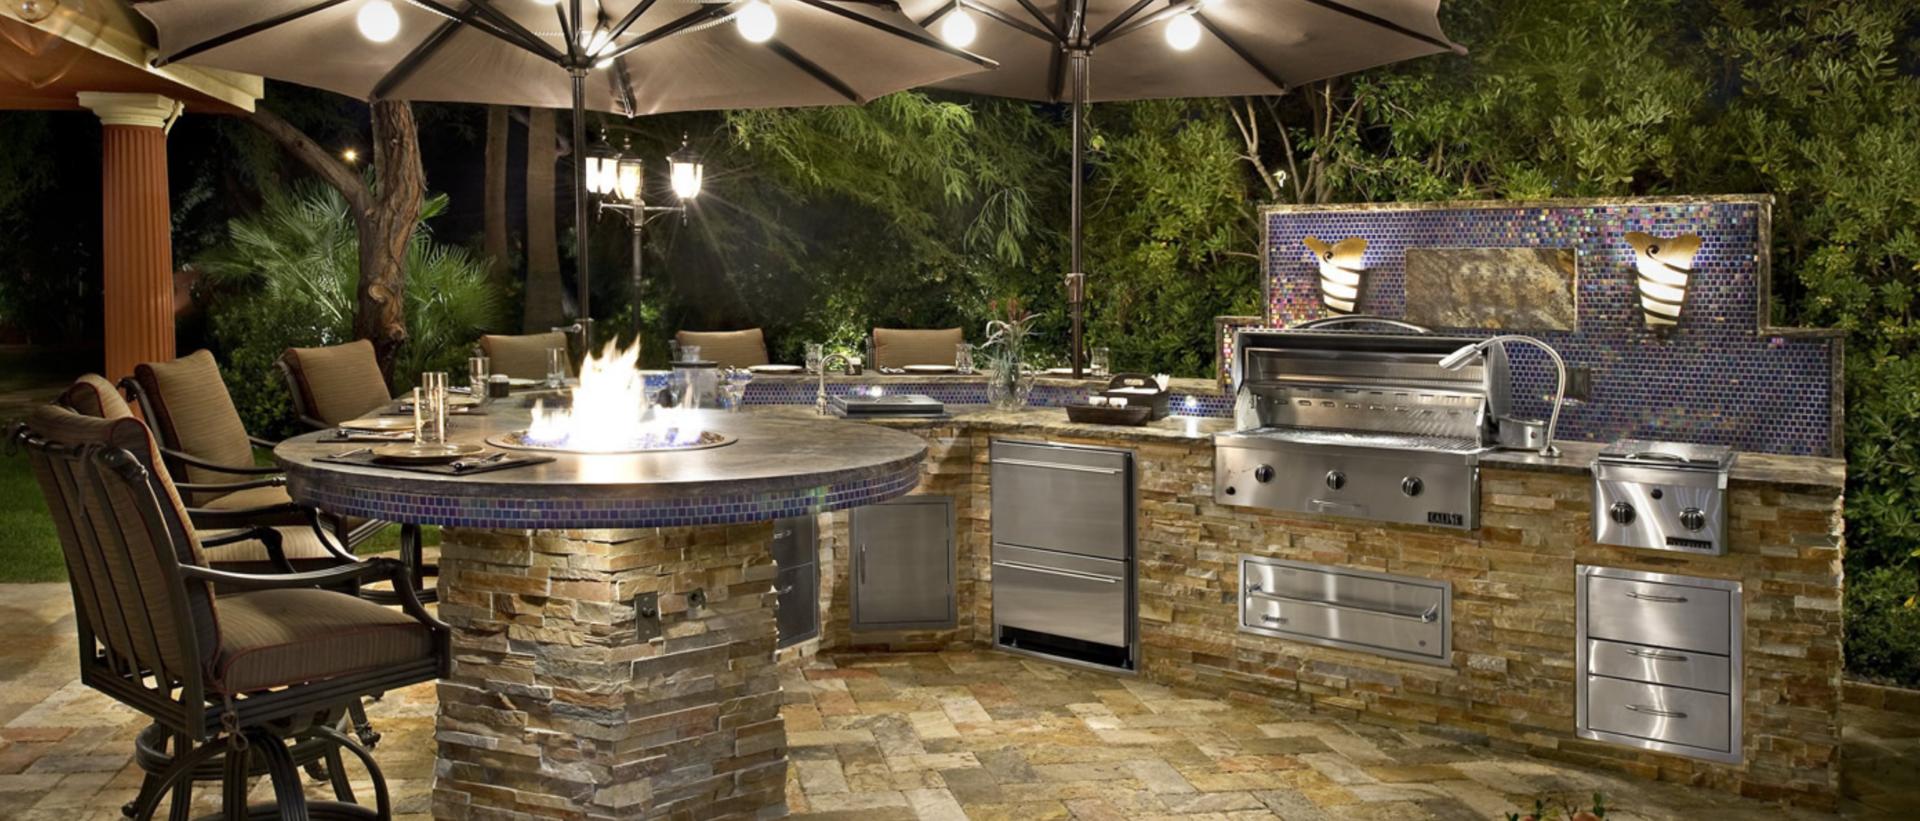 Sarasota Outdoor Kitchens Gallery Round Columns And Blue Tiles Outdoor Kitchen Design Backyard Kitchen Modern Outdoor Kitchen